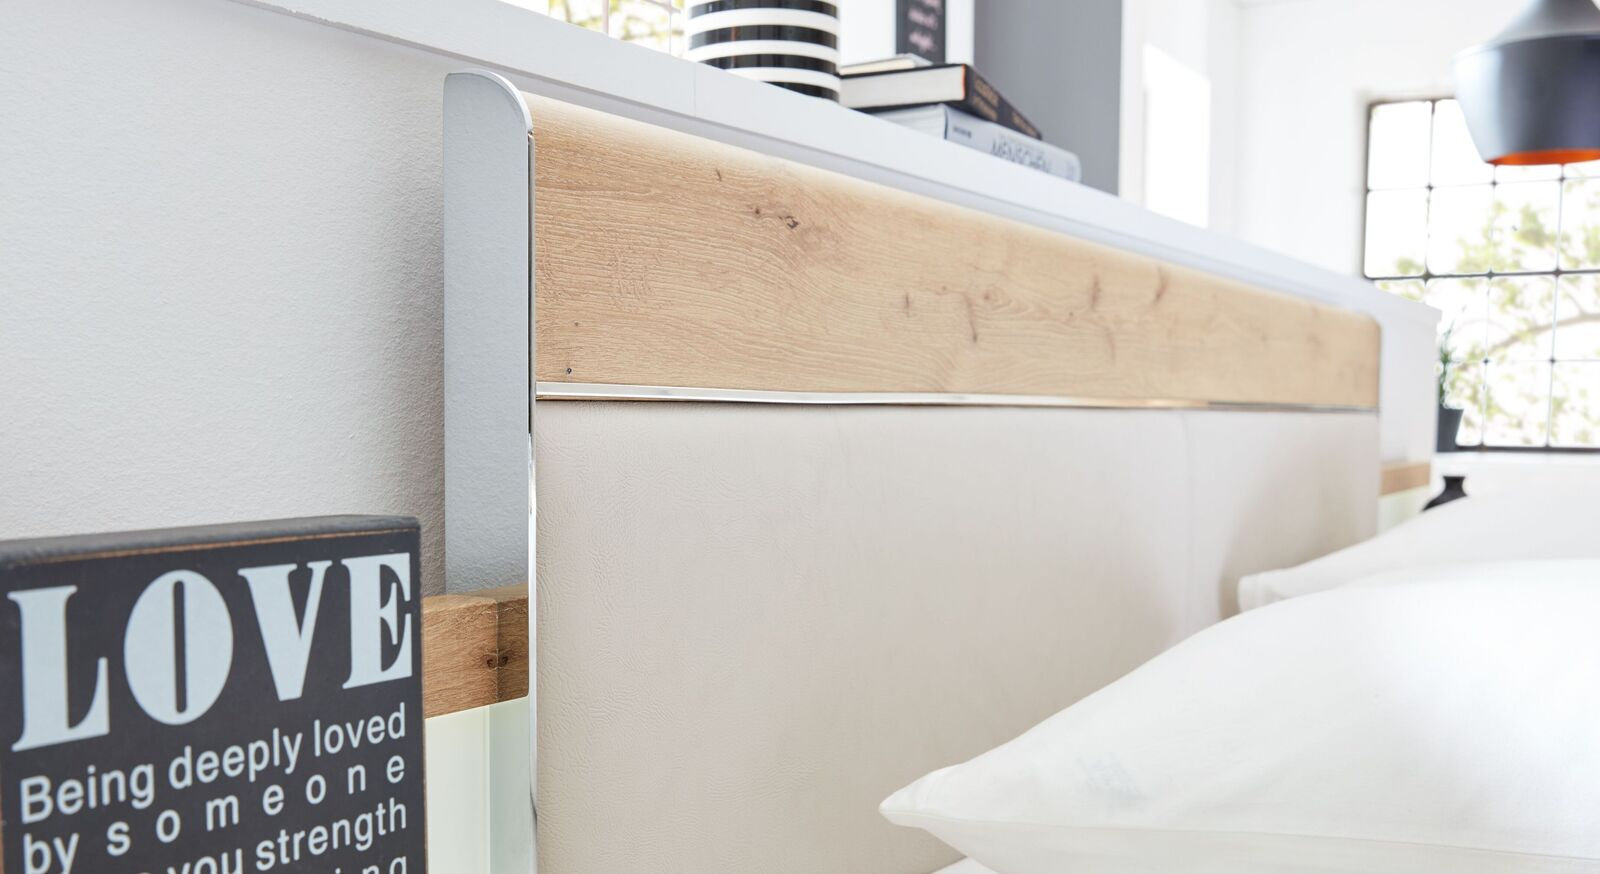 INTERLIVING Bett 1017 mit Chromelementen am Kopfteil